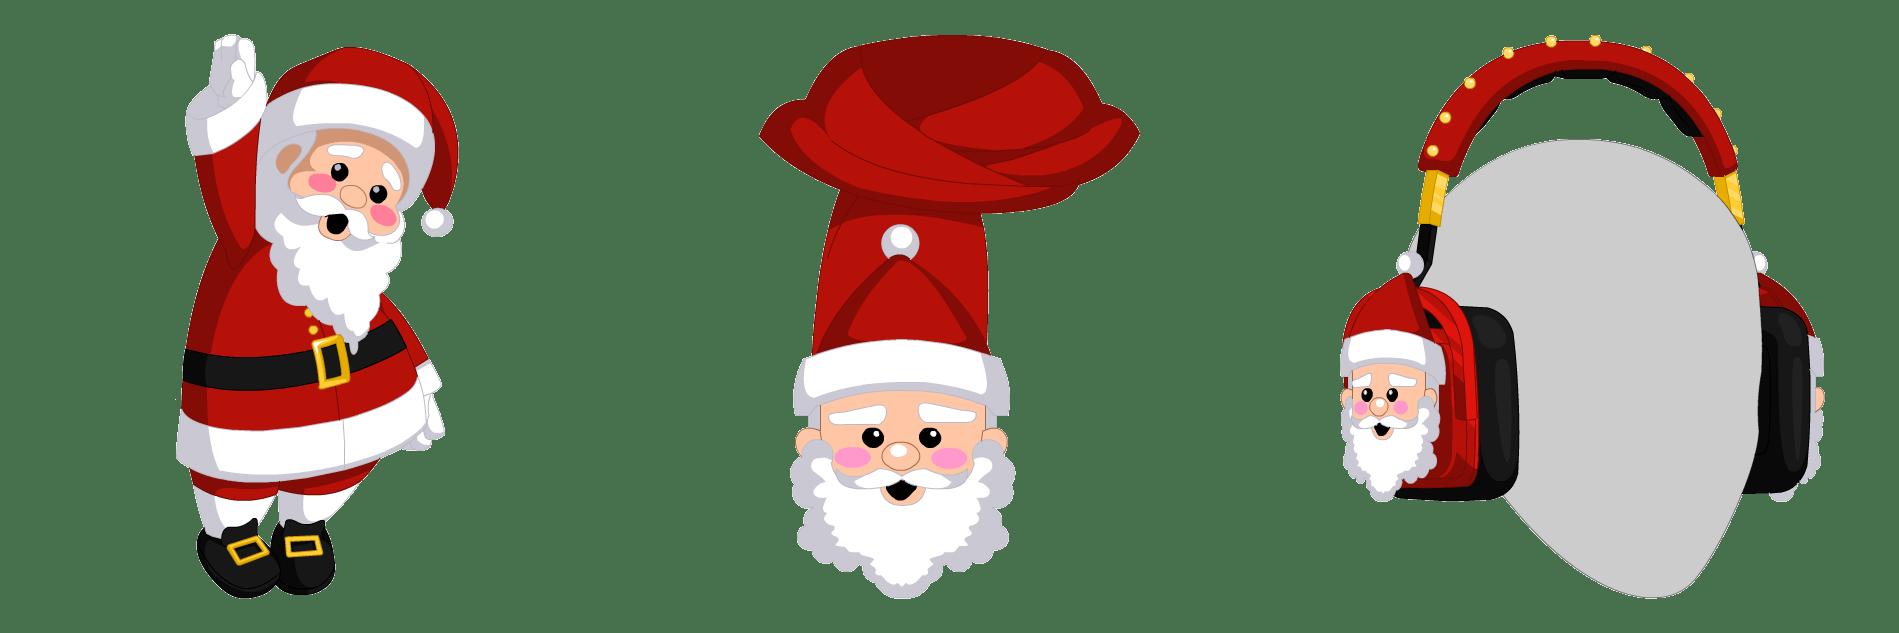 Headphone clipart santa claus. Caroling the ourworld news